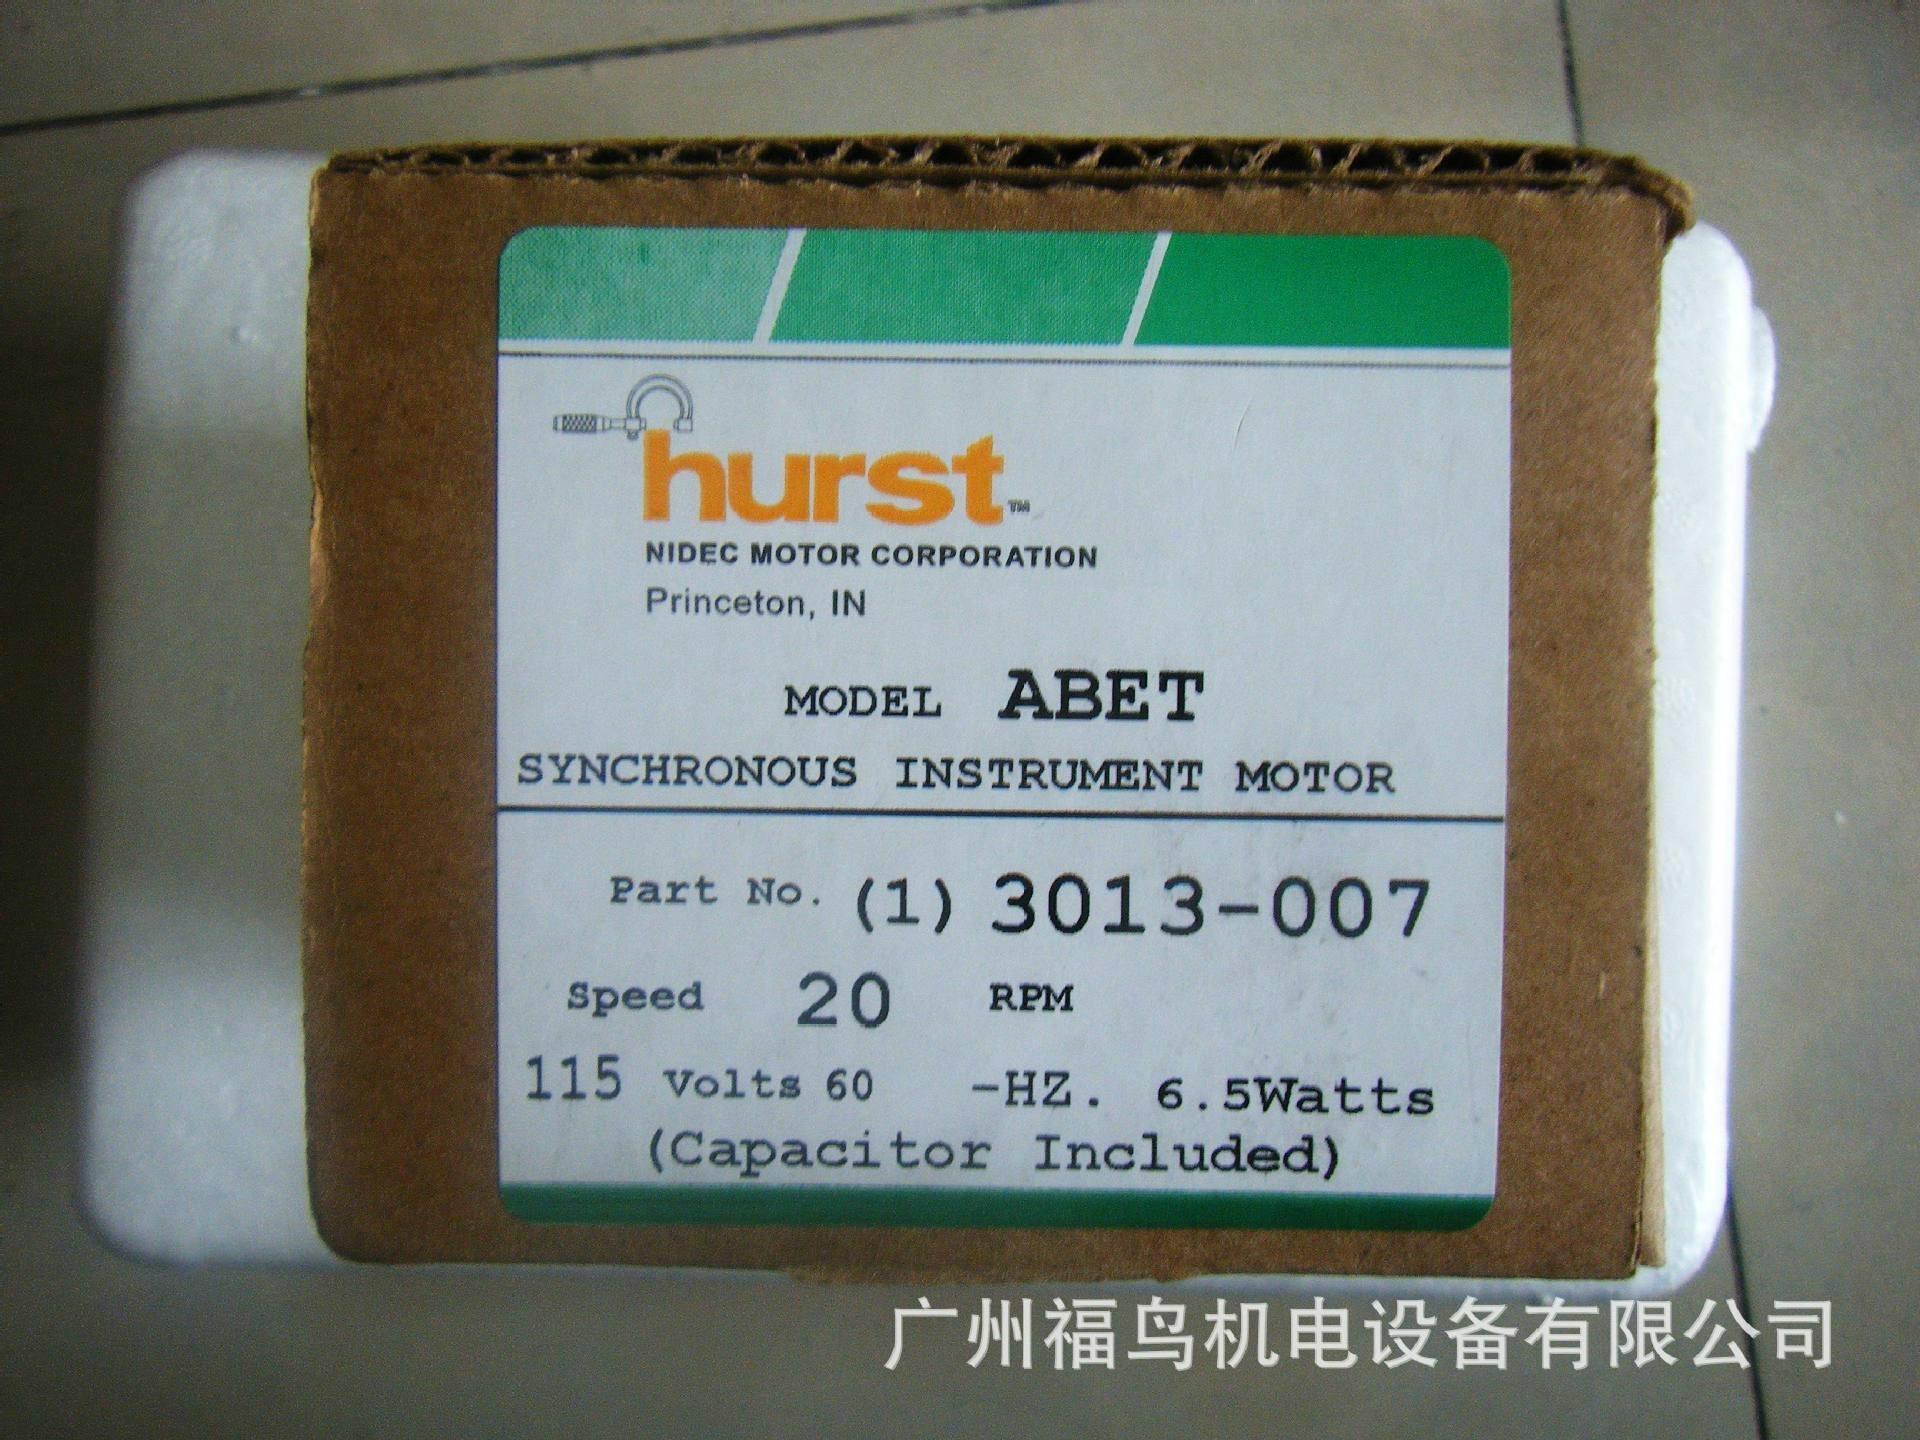 HURST馬達, 電機, 訂貨號: 3013-007